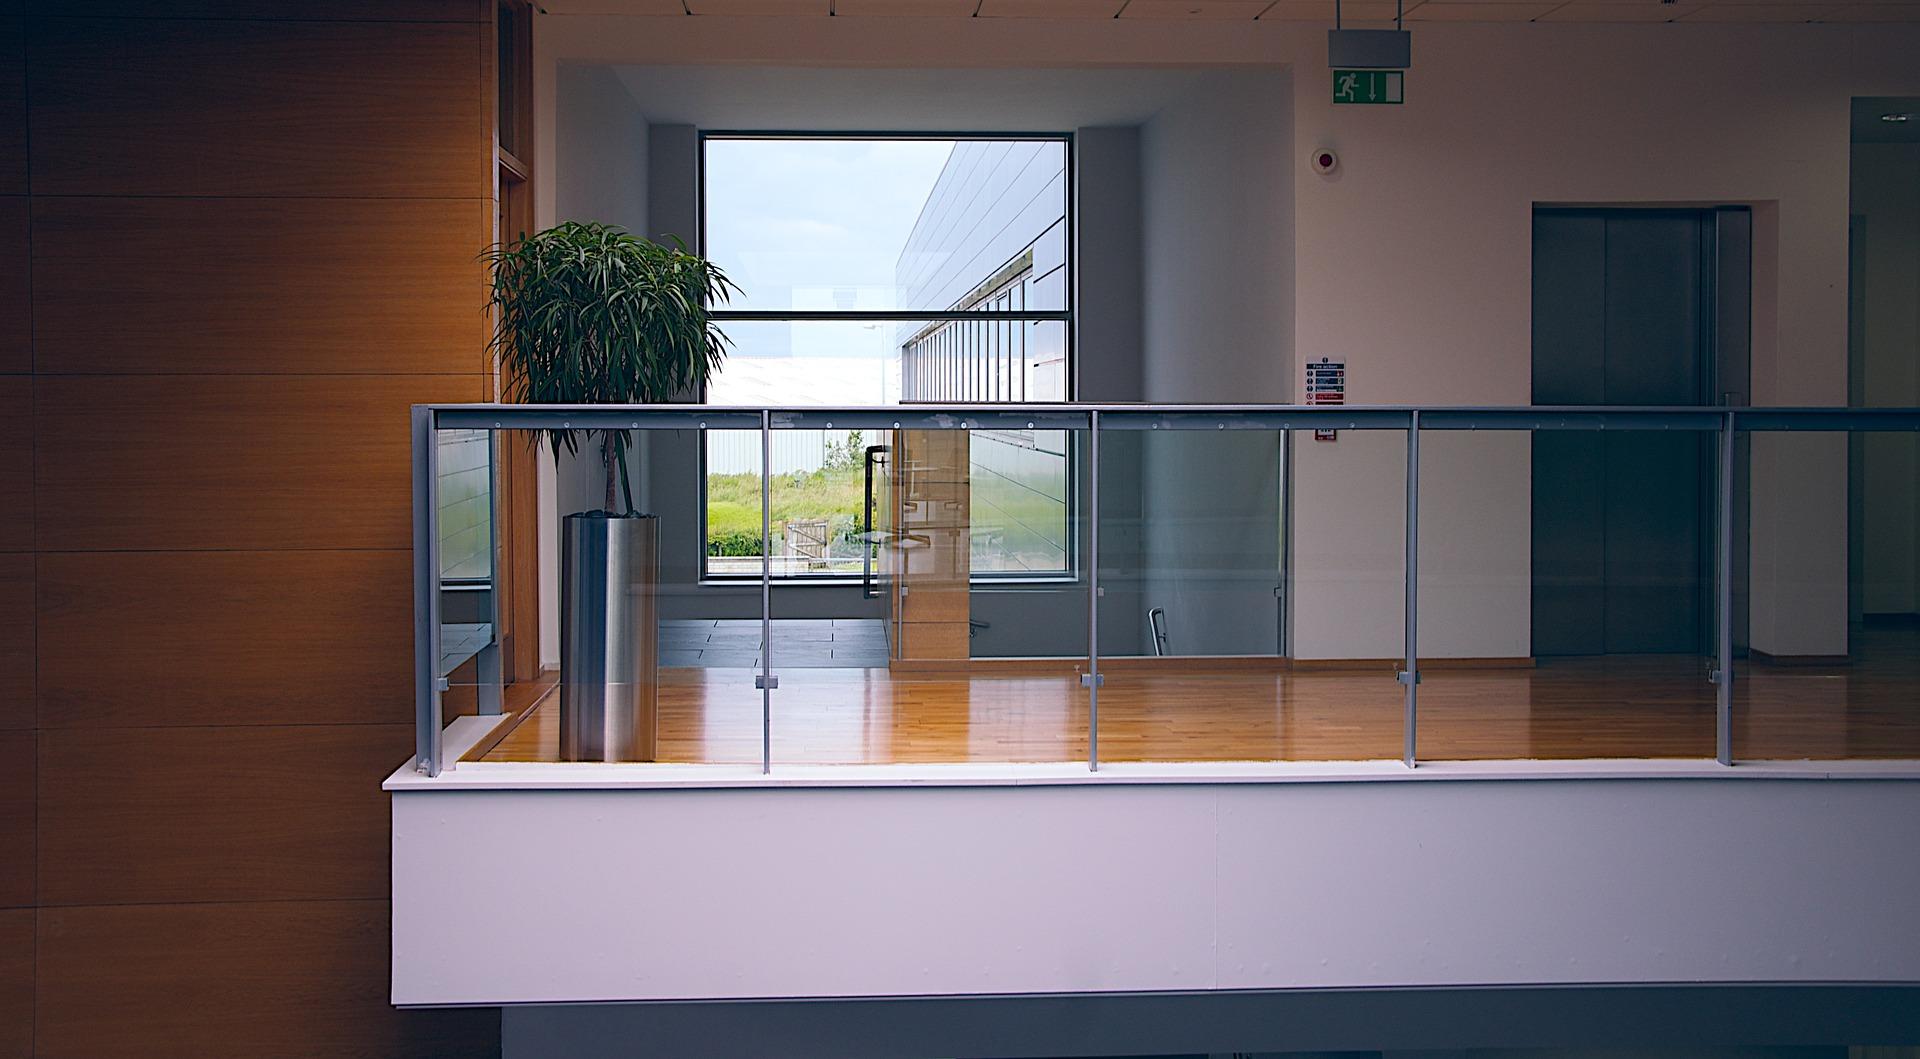 modern-office-1044807_1920.jpg